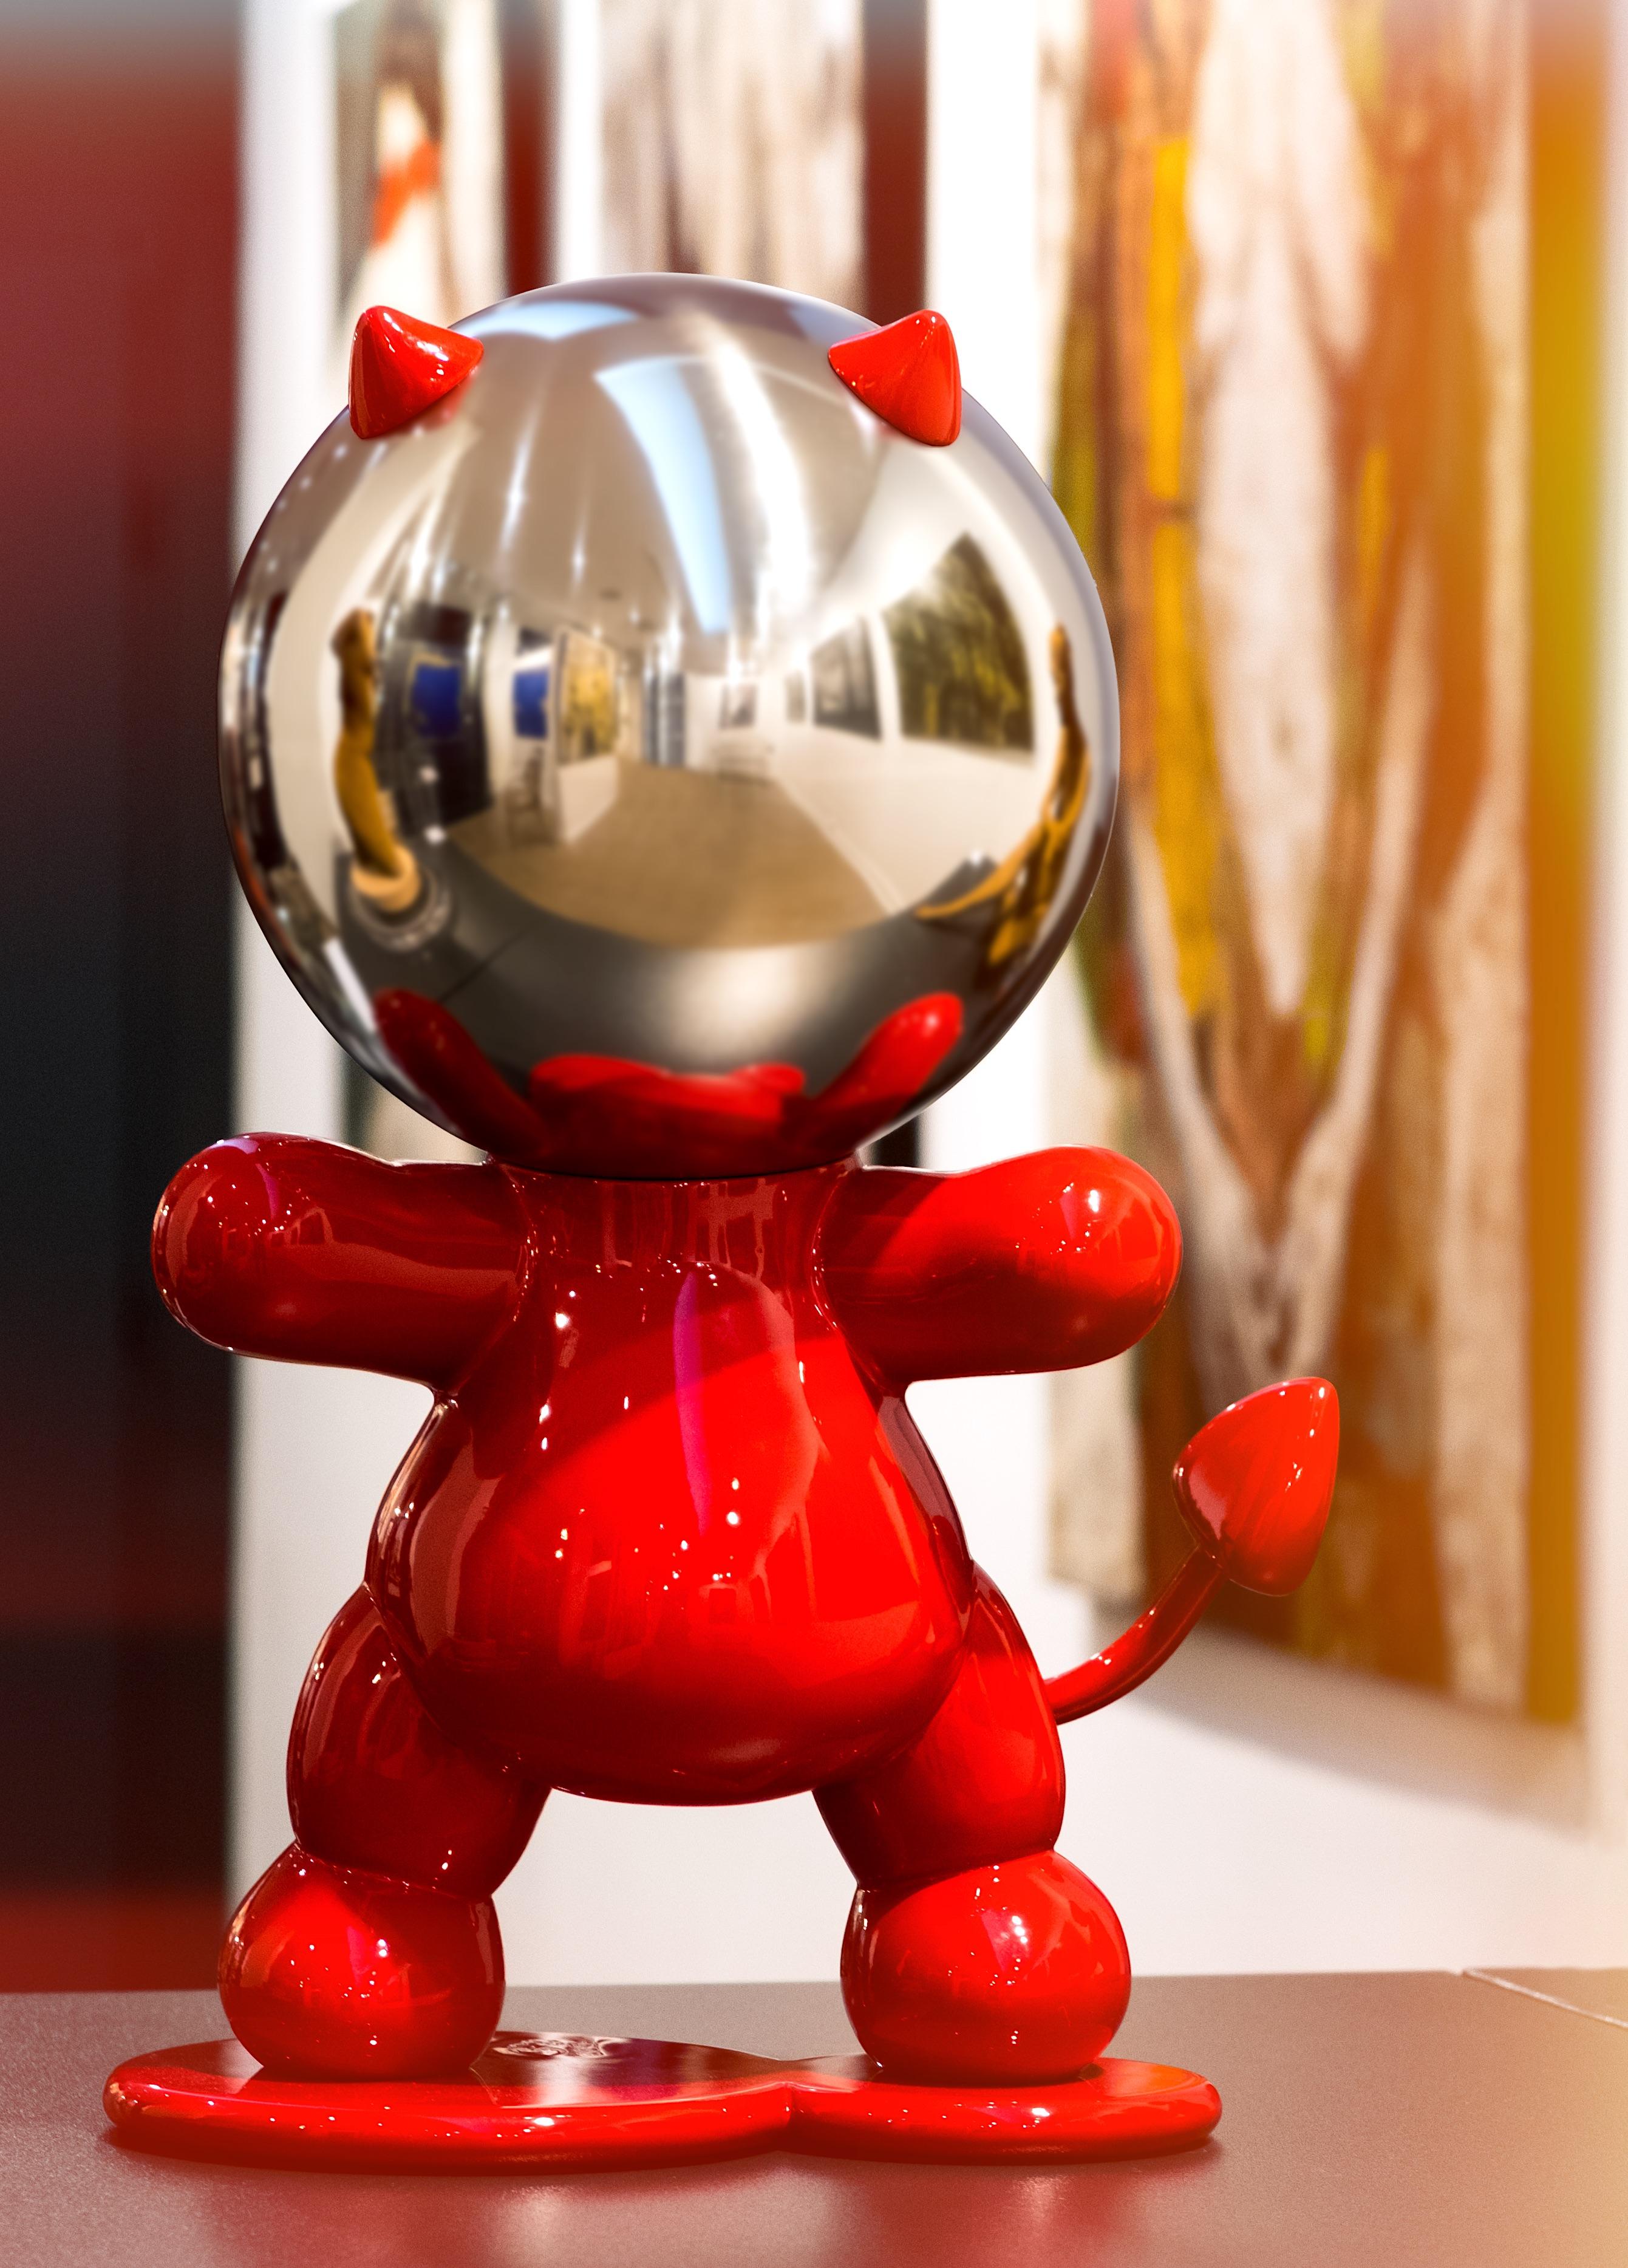 DIABLO RED GLOSS  standing